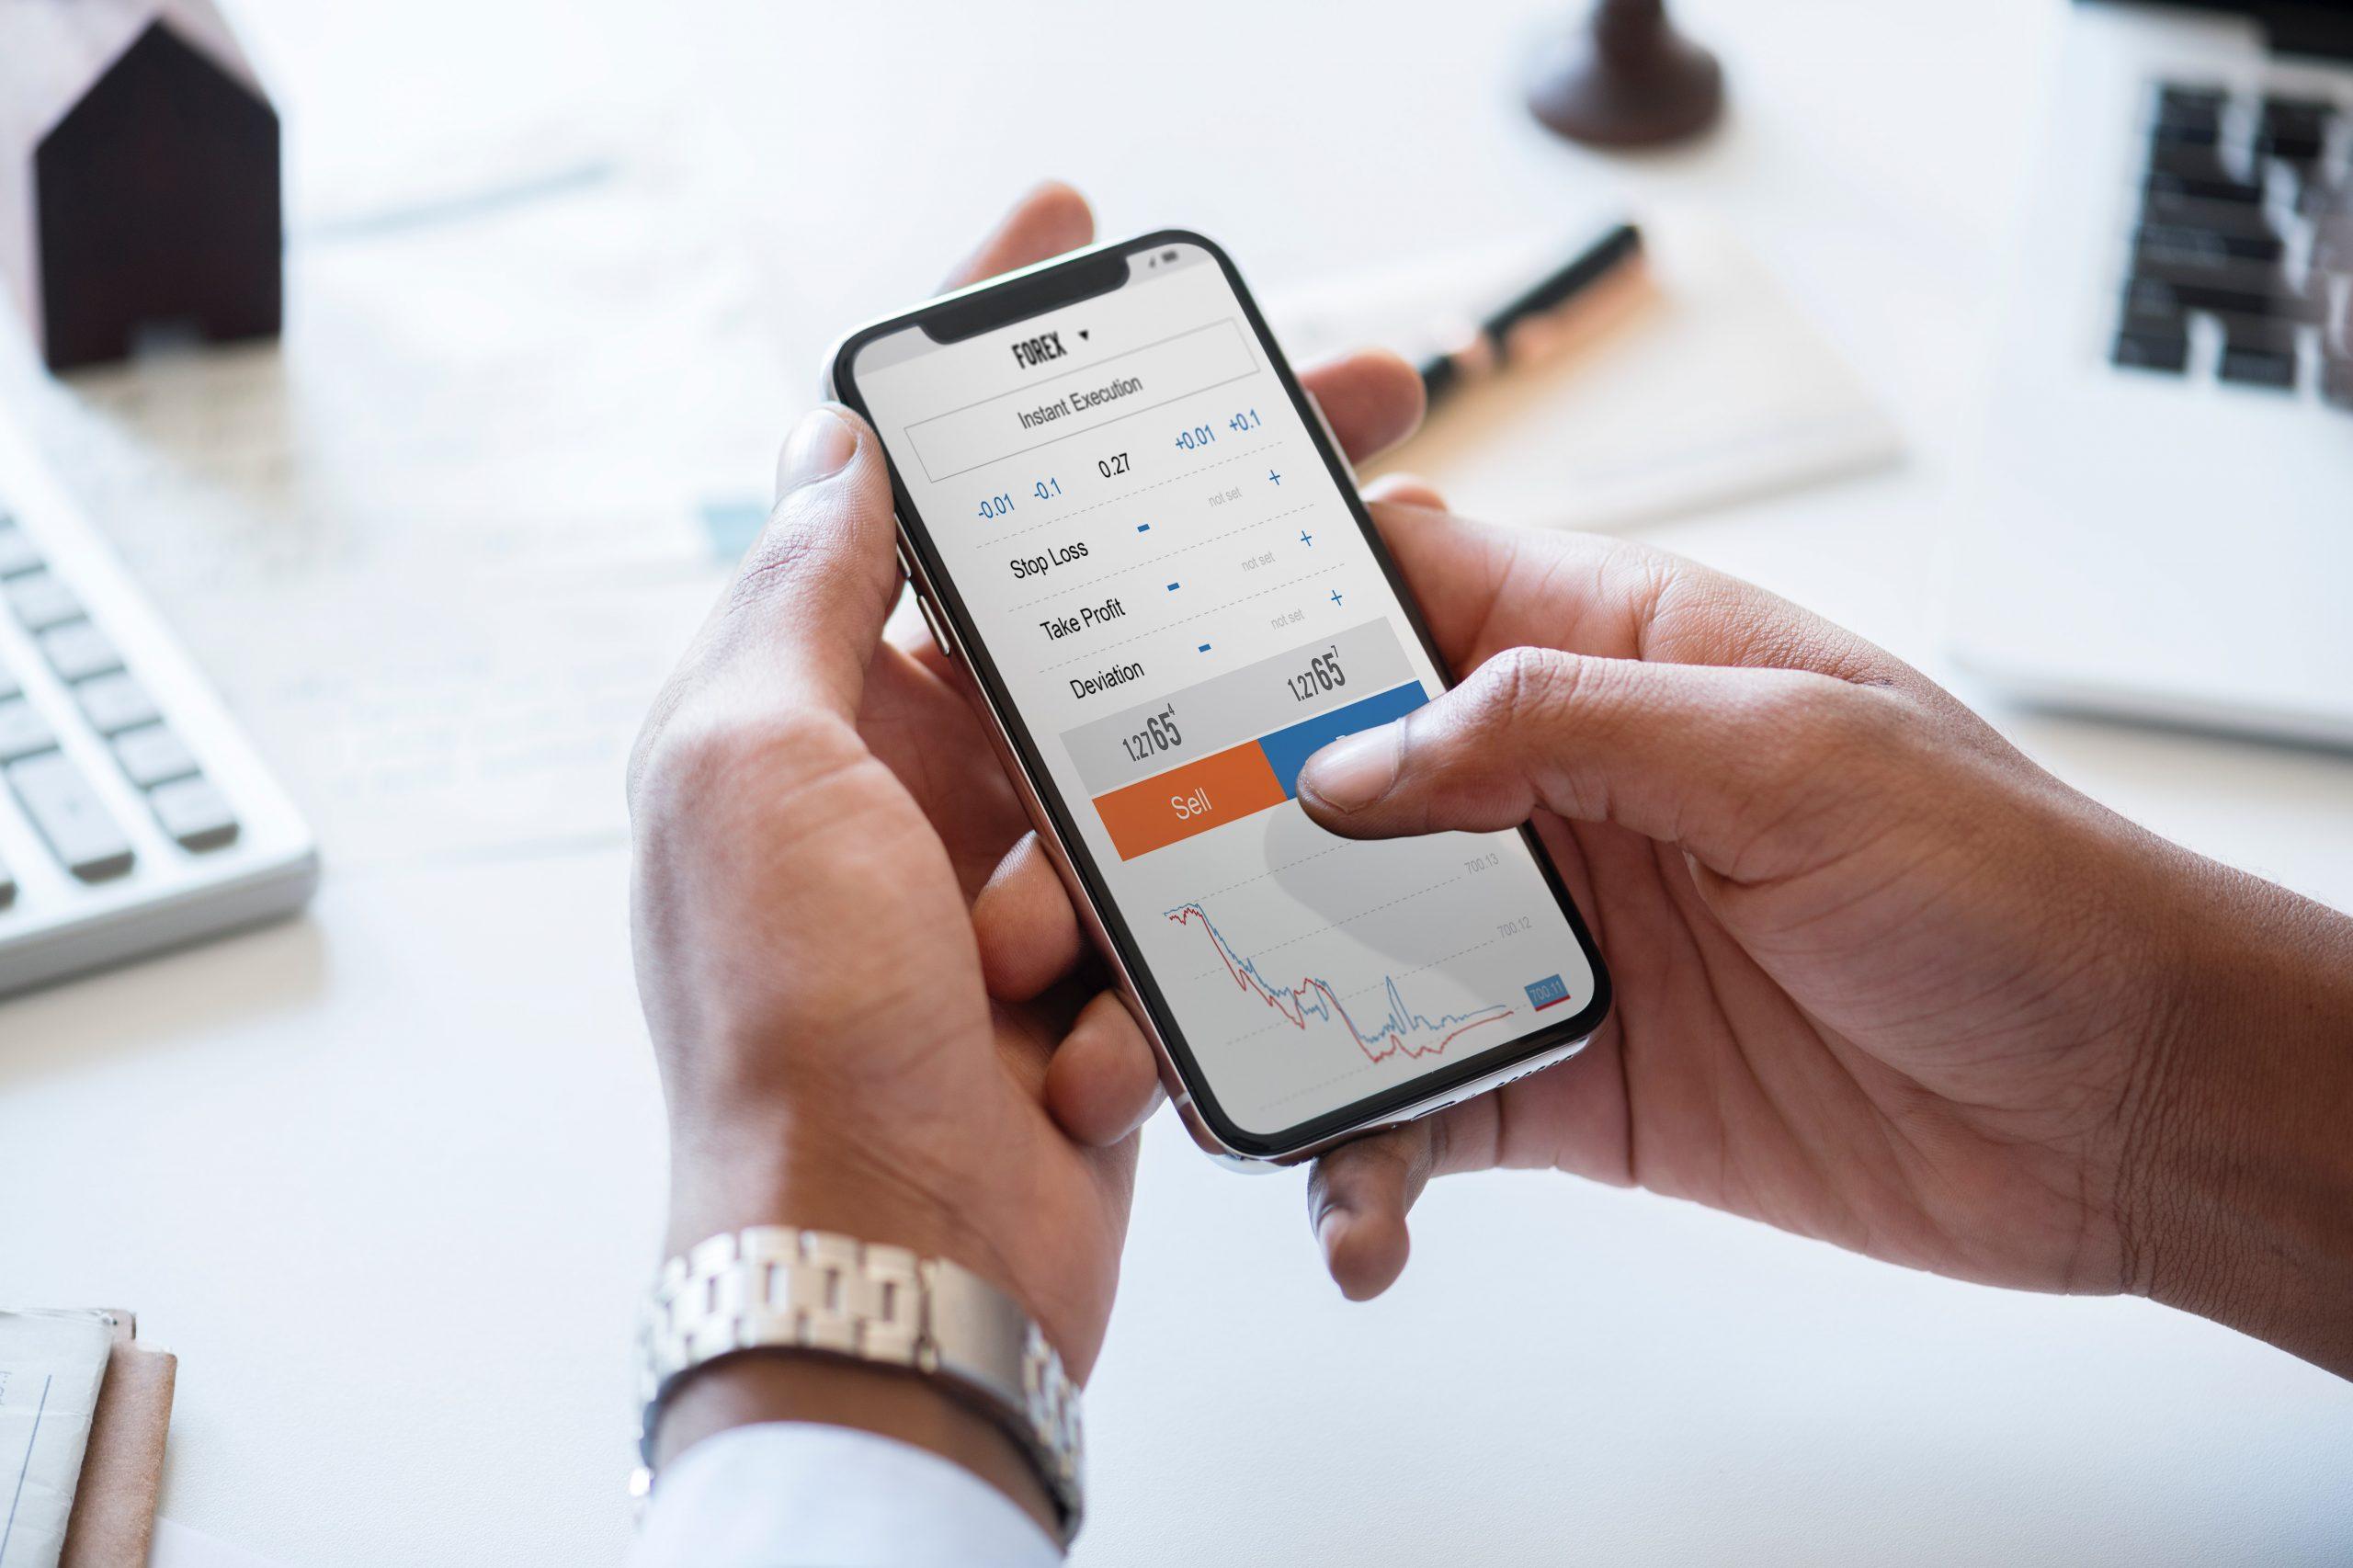 https://www.yulcom-technologies.com/wp-content/uploads/2018/03/mobile-money-yulcom-.jpg